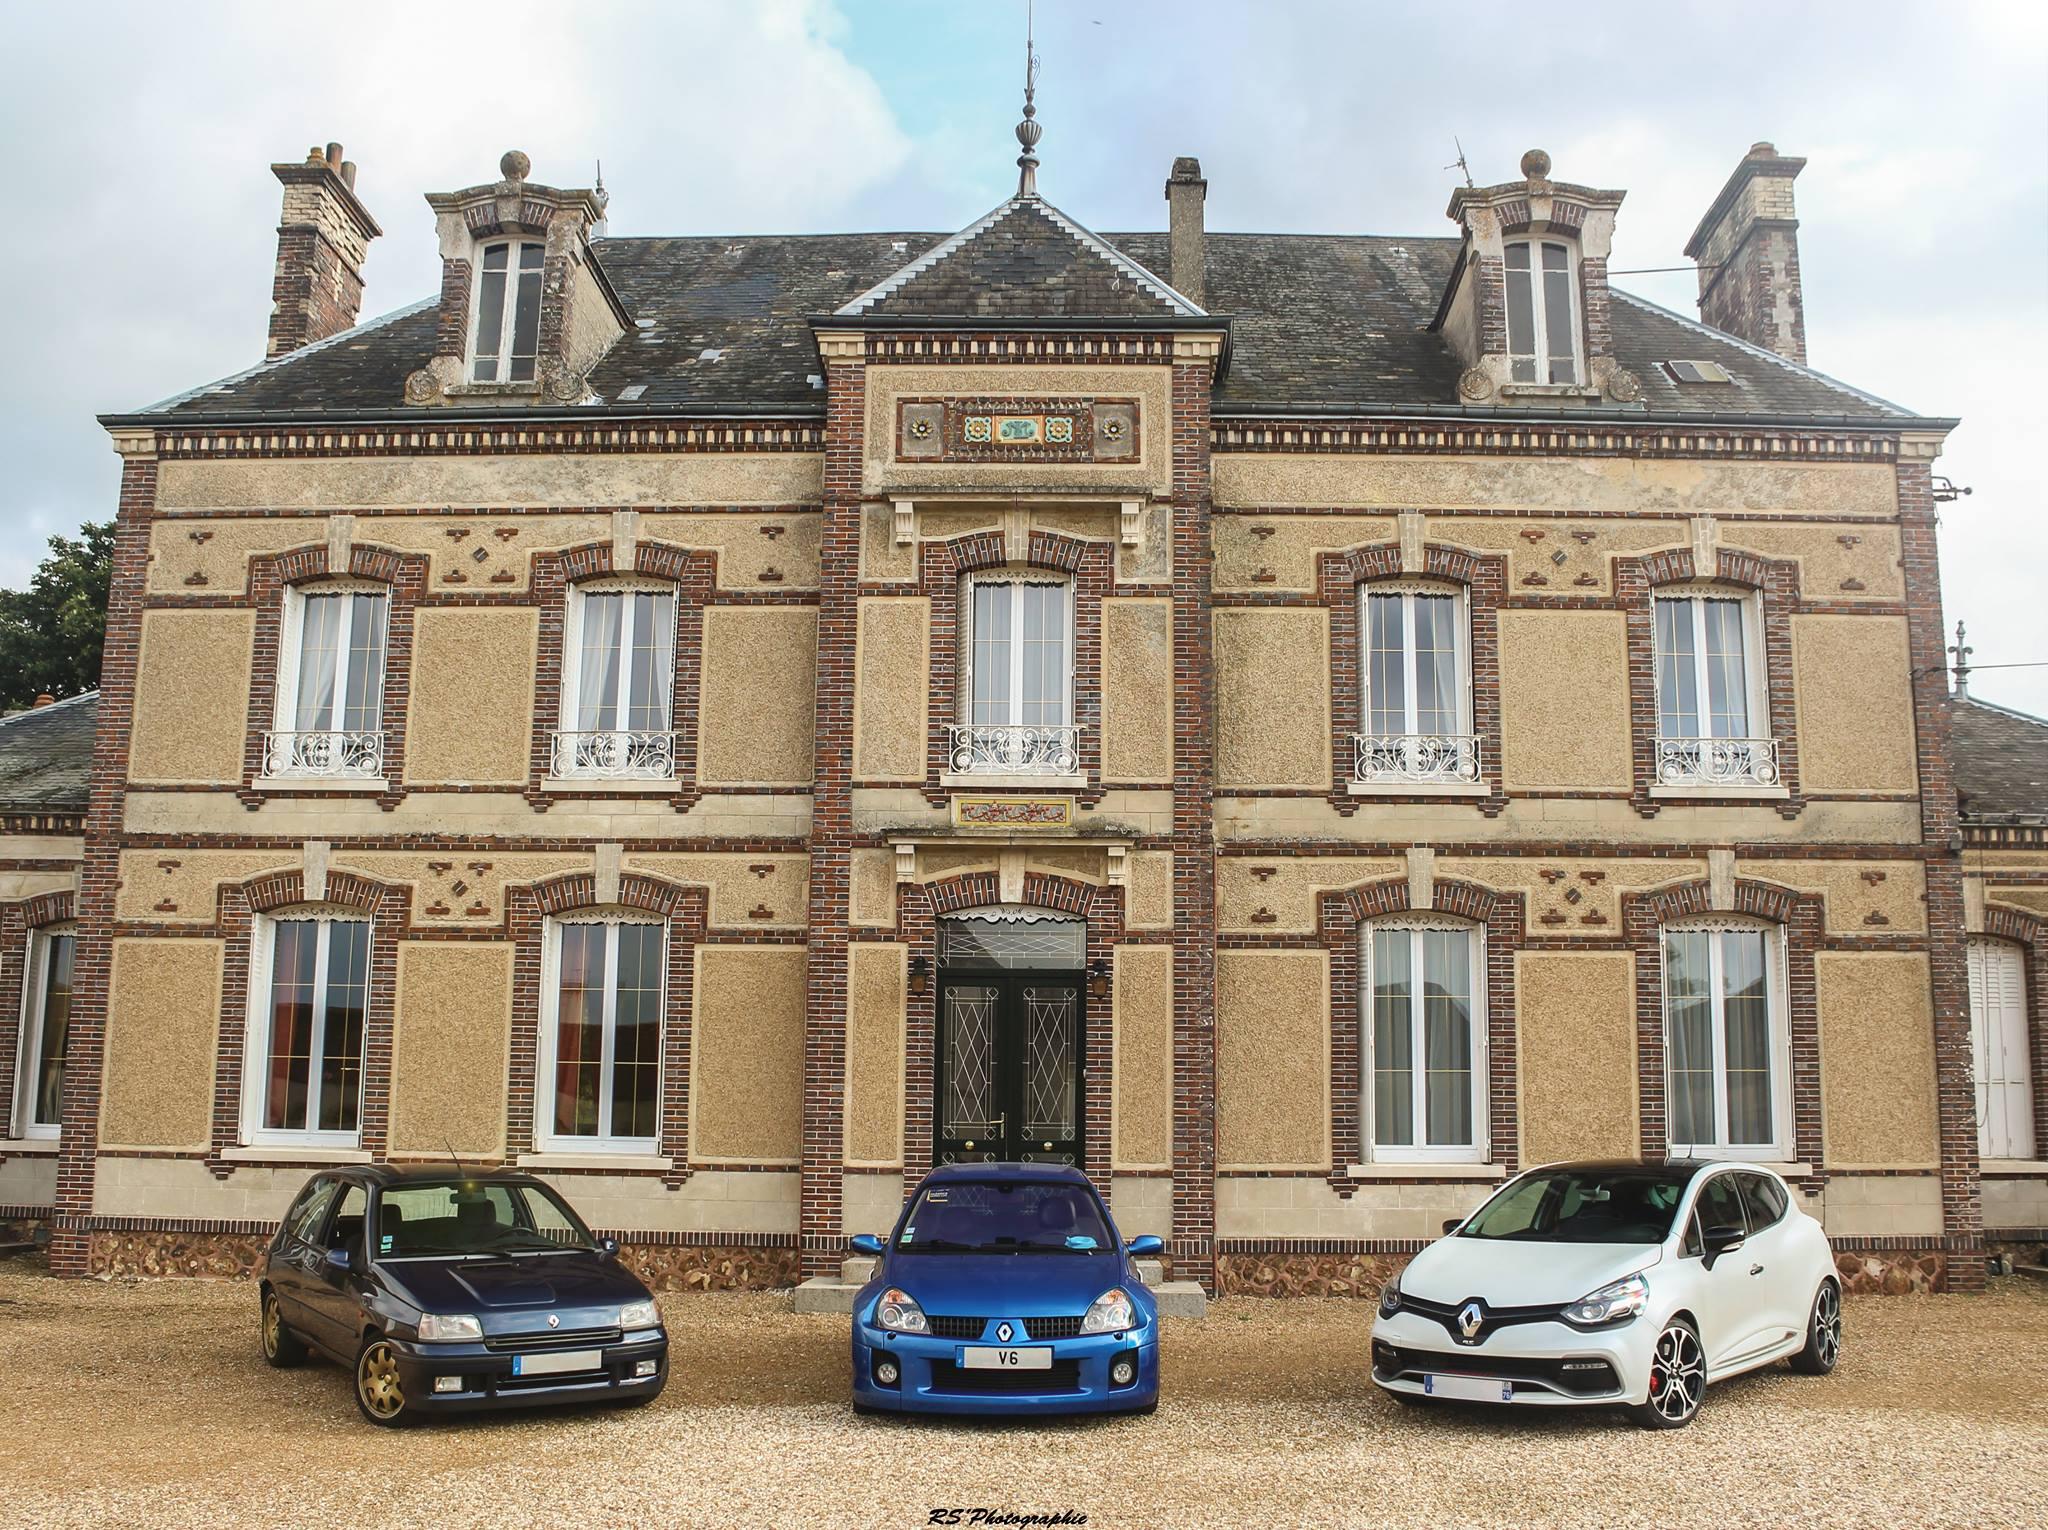 Renault Clio - génération - Arnaud Demasier RS Photographie